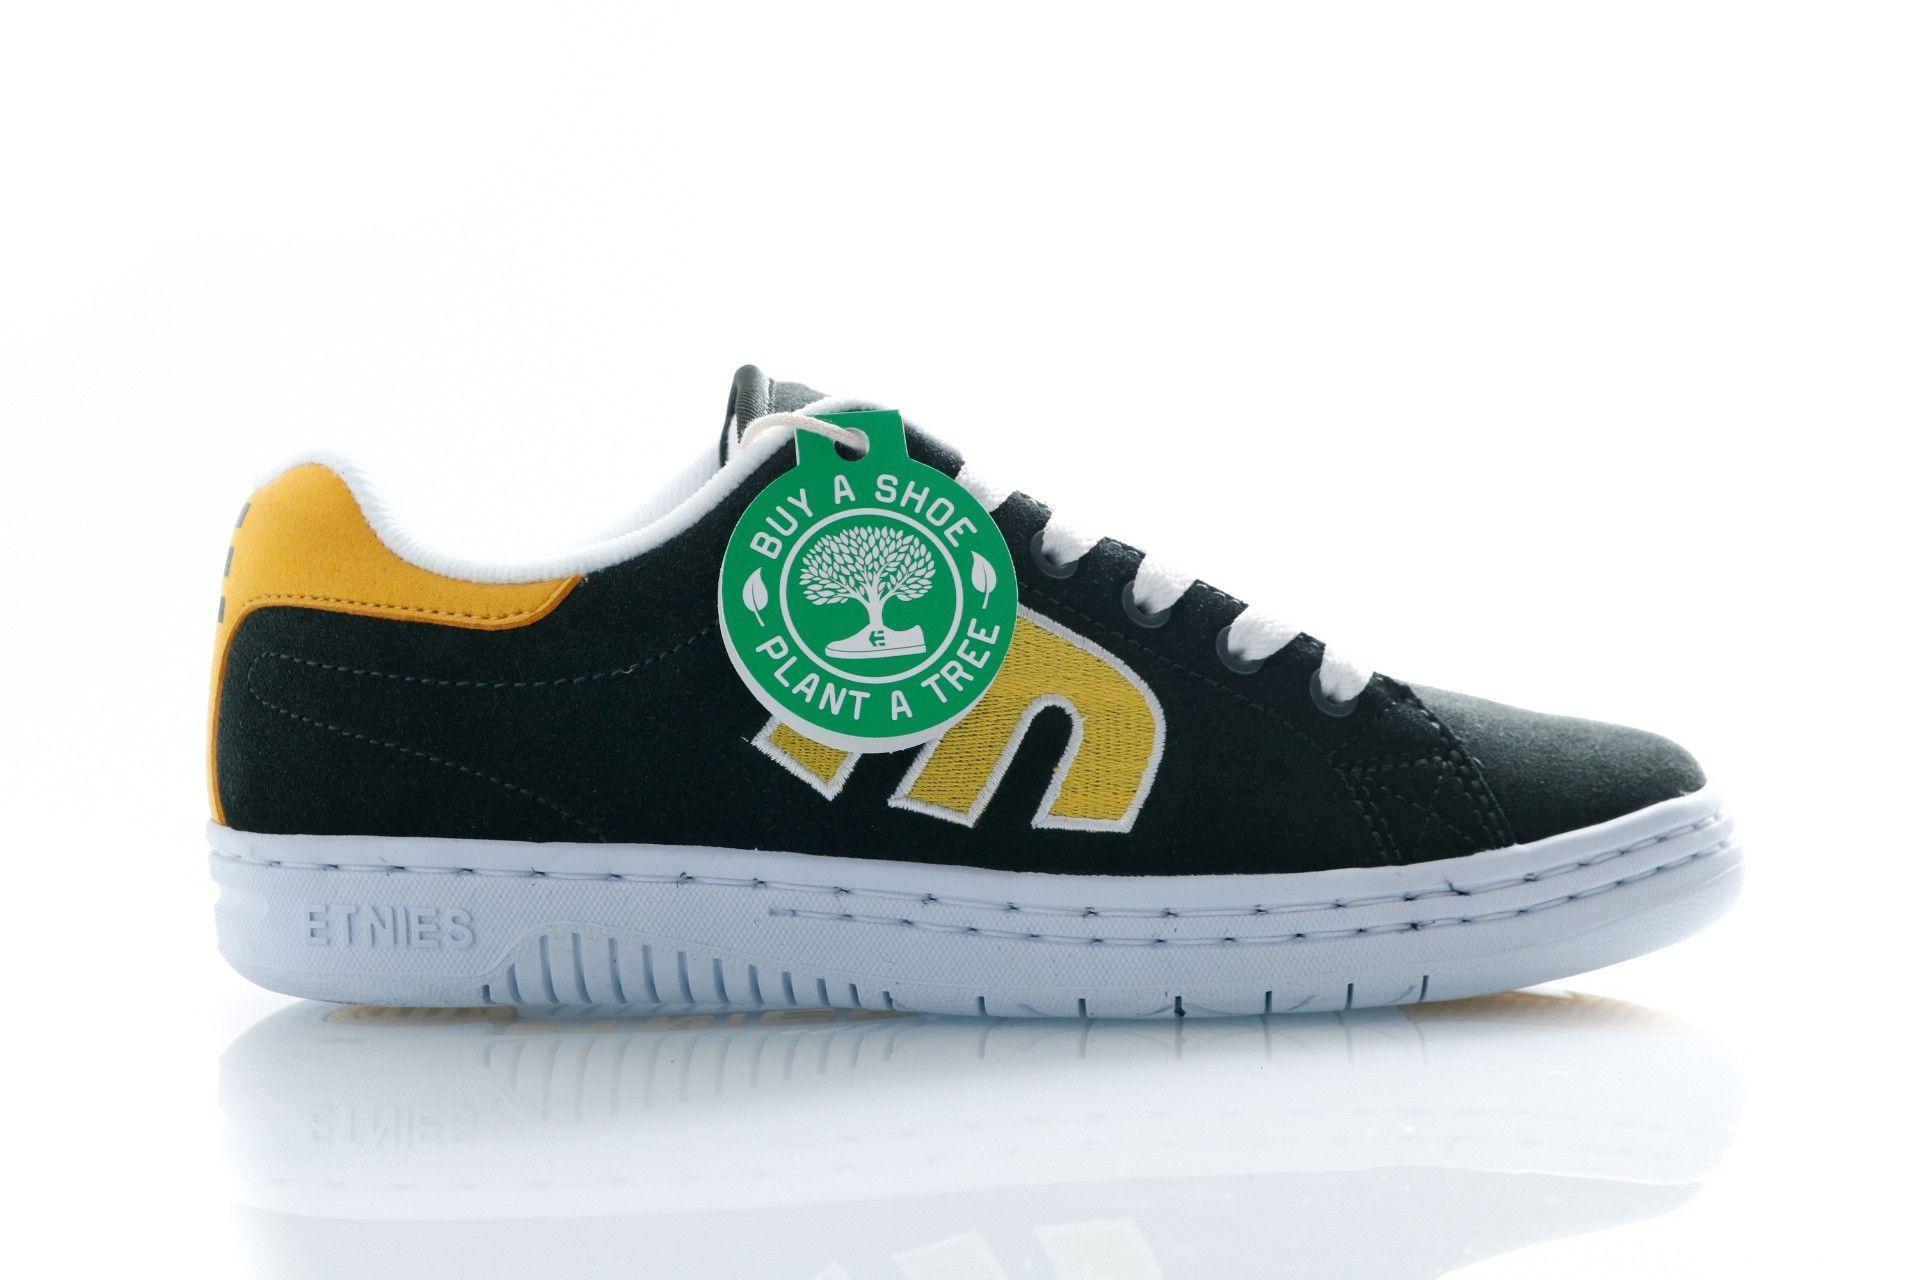 Afbeelding van Etnies Sneakers Calli-Cut Green/White/Yellow 4101000505